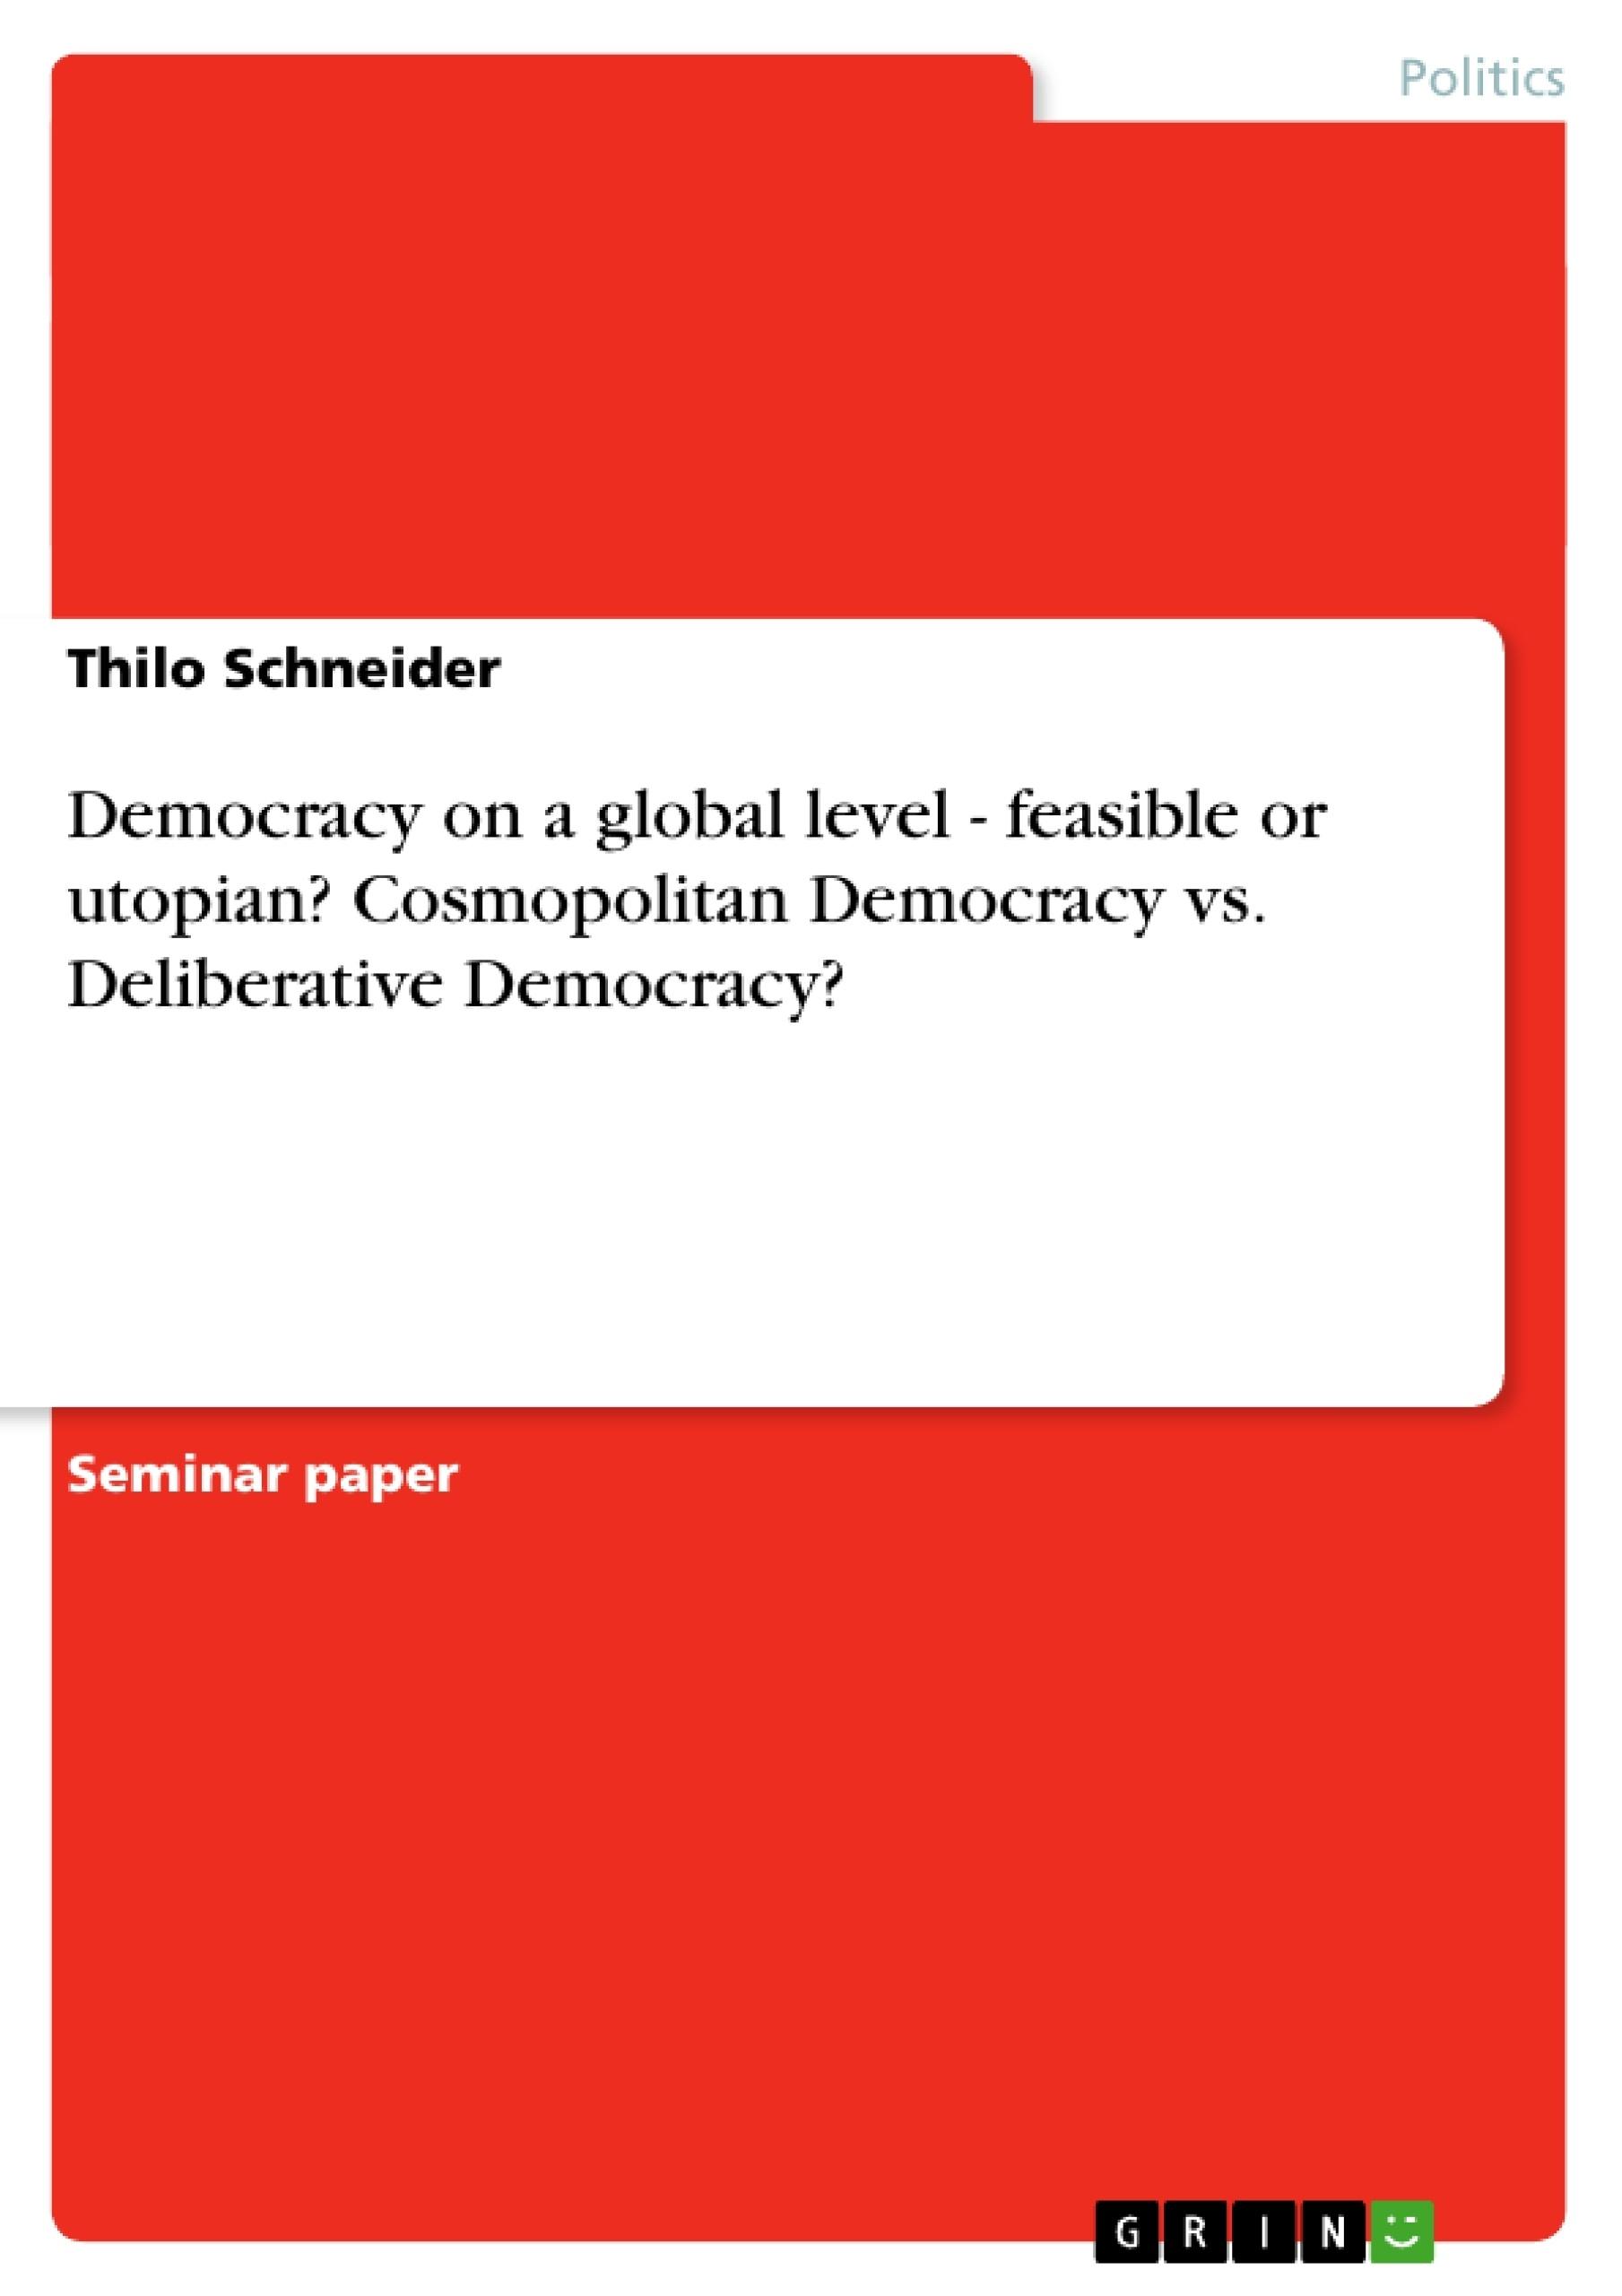 Title: Democracy on a global level - feasible or utopian? Cosmopolitan Democracy vs. Deliberative Democracy?